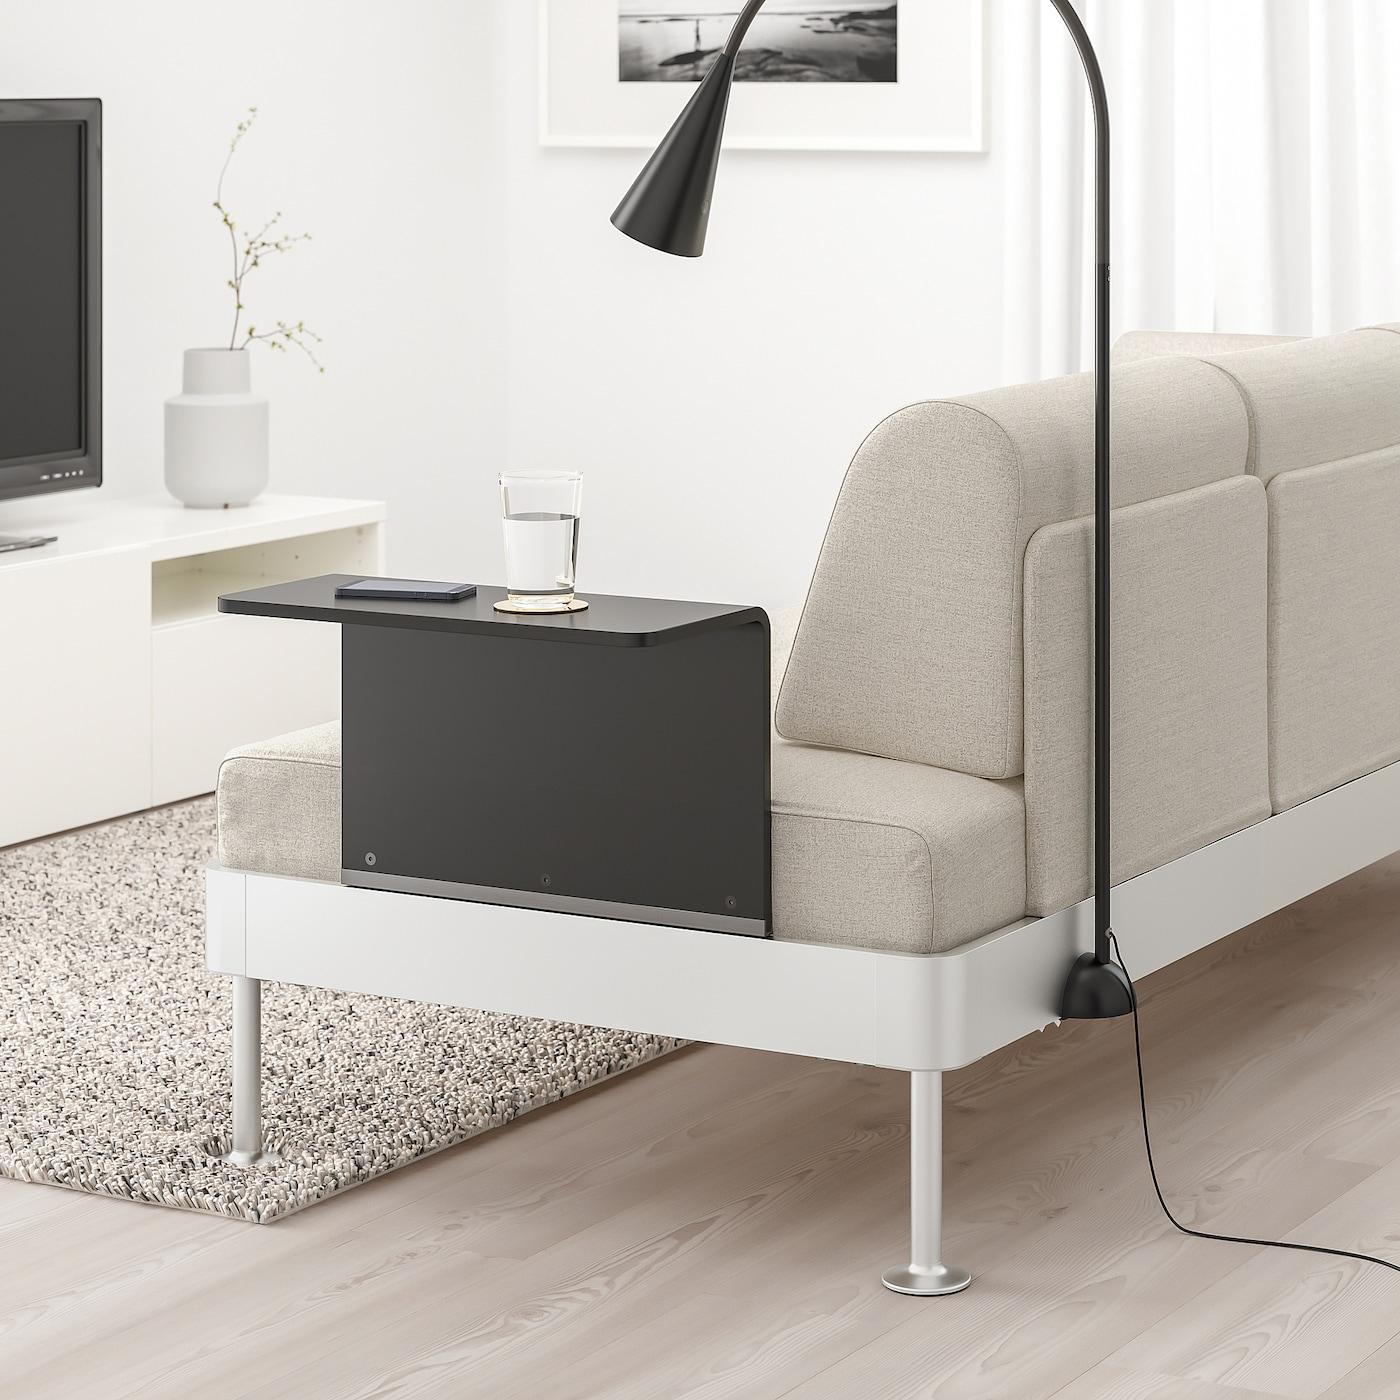 Picture of: Delaktig 3 Pers Sofa Med Sofabord Og Lampe Gunnared Beige Ikea